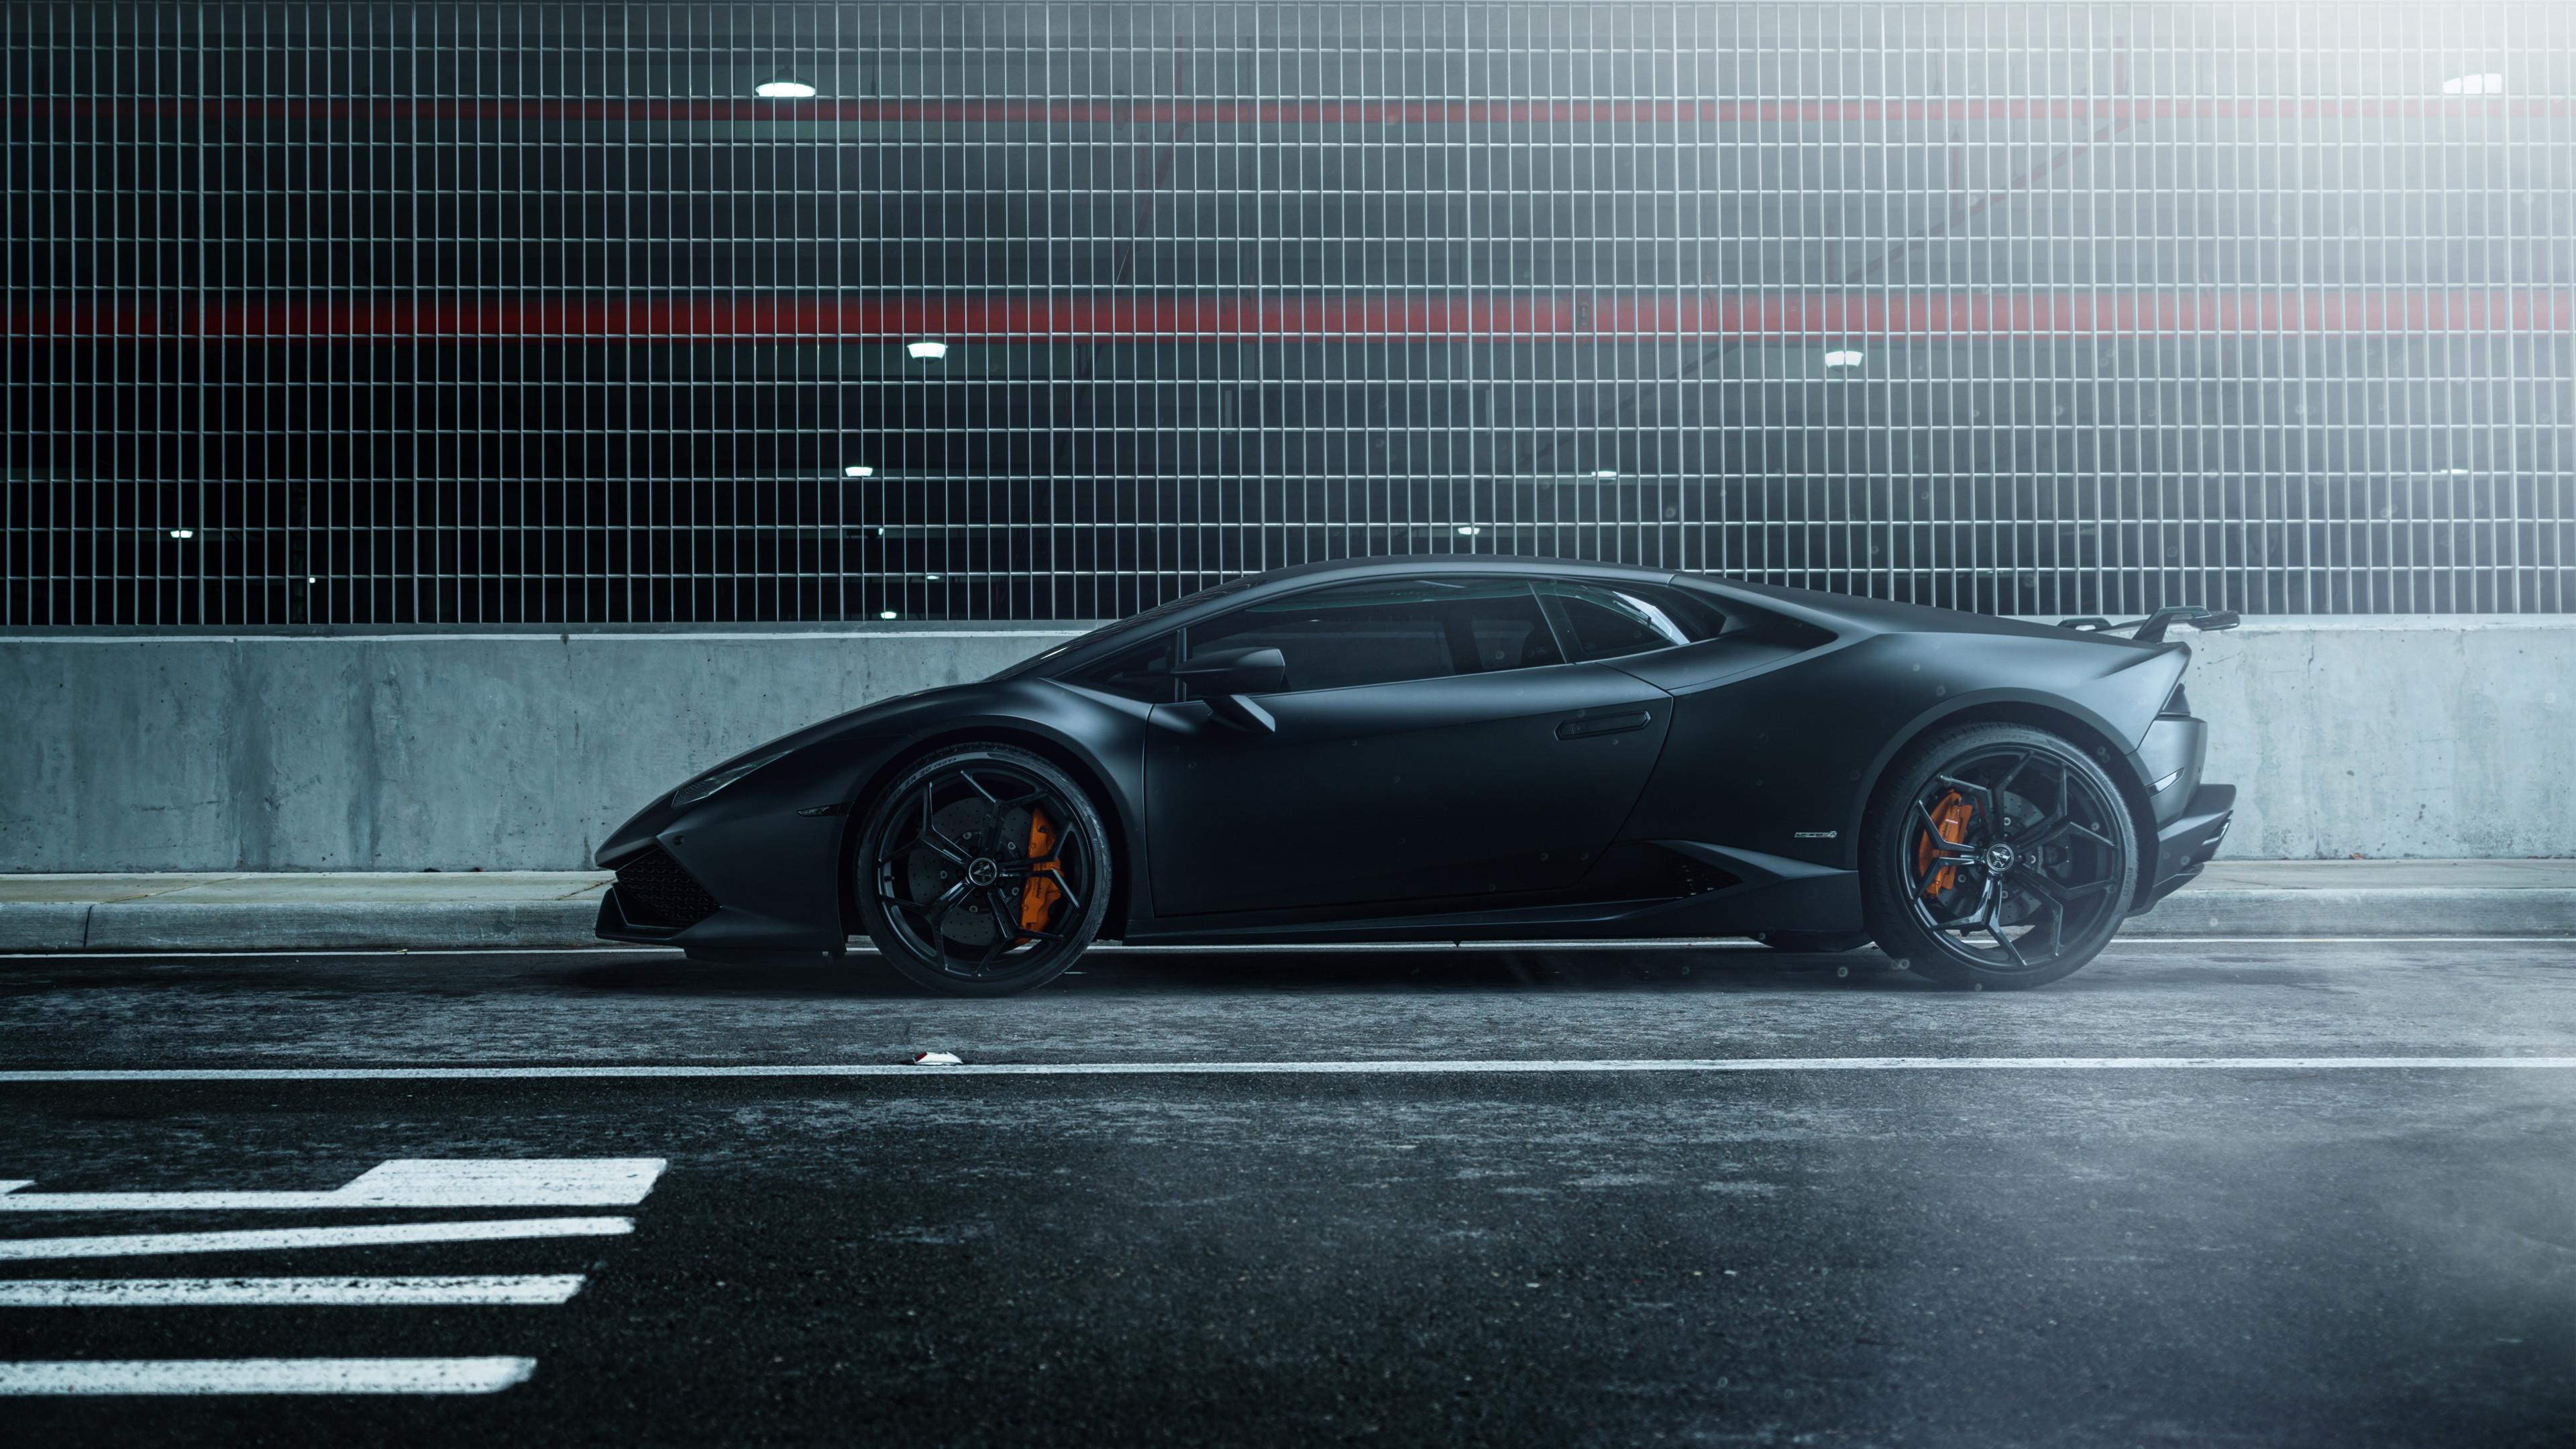 1920x1080 Lamborghini Aventador Wallpapers HD Resolution Veneno Hd Gallardo 1920A 1080